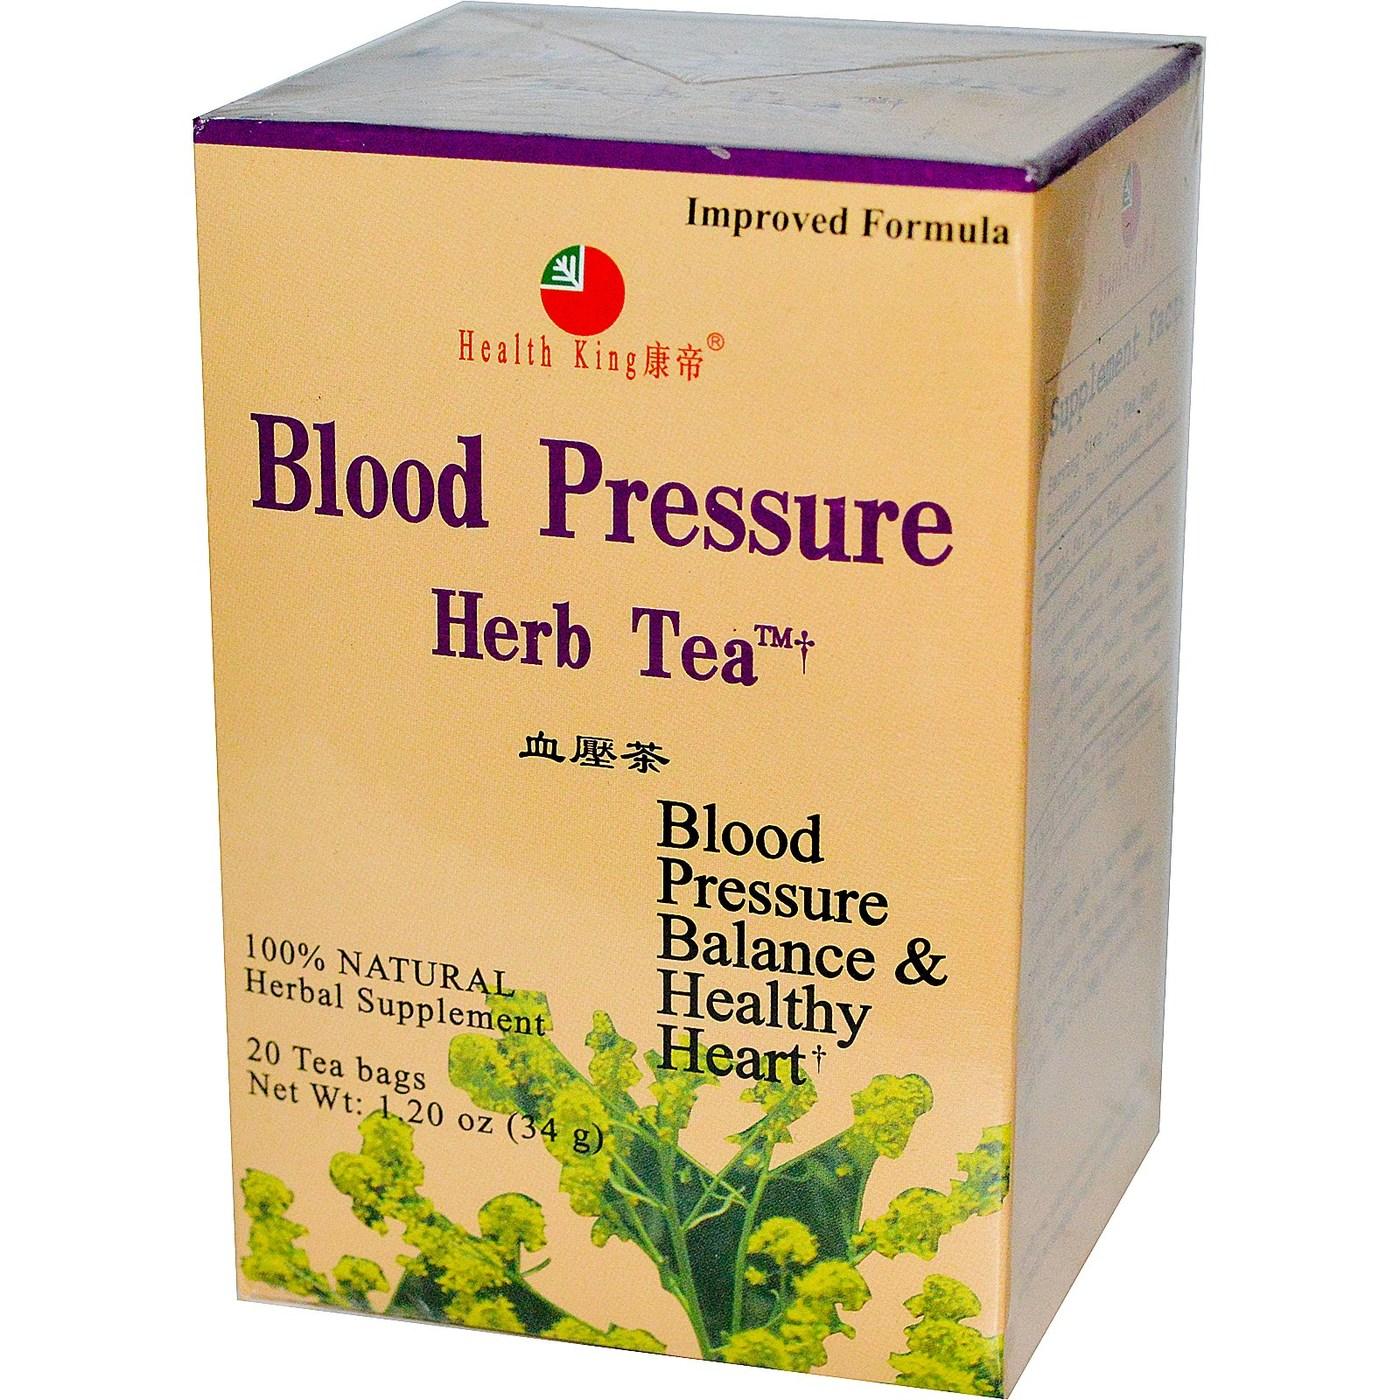 Herbal tea for high blood pressure